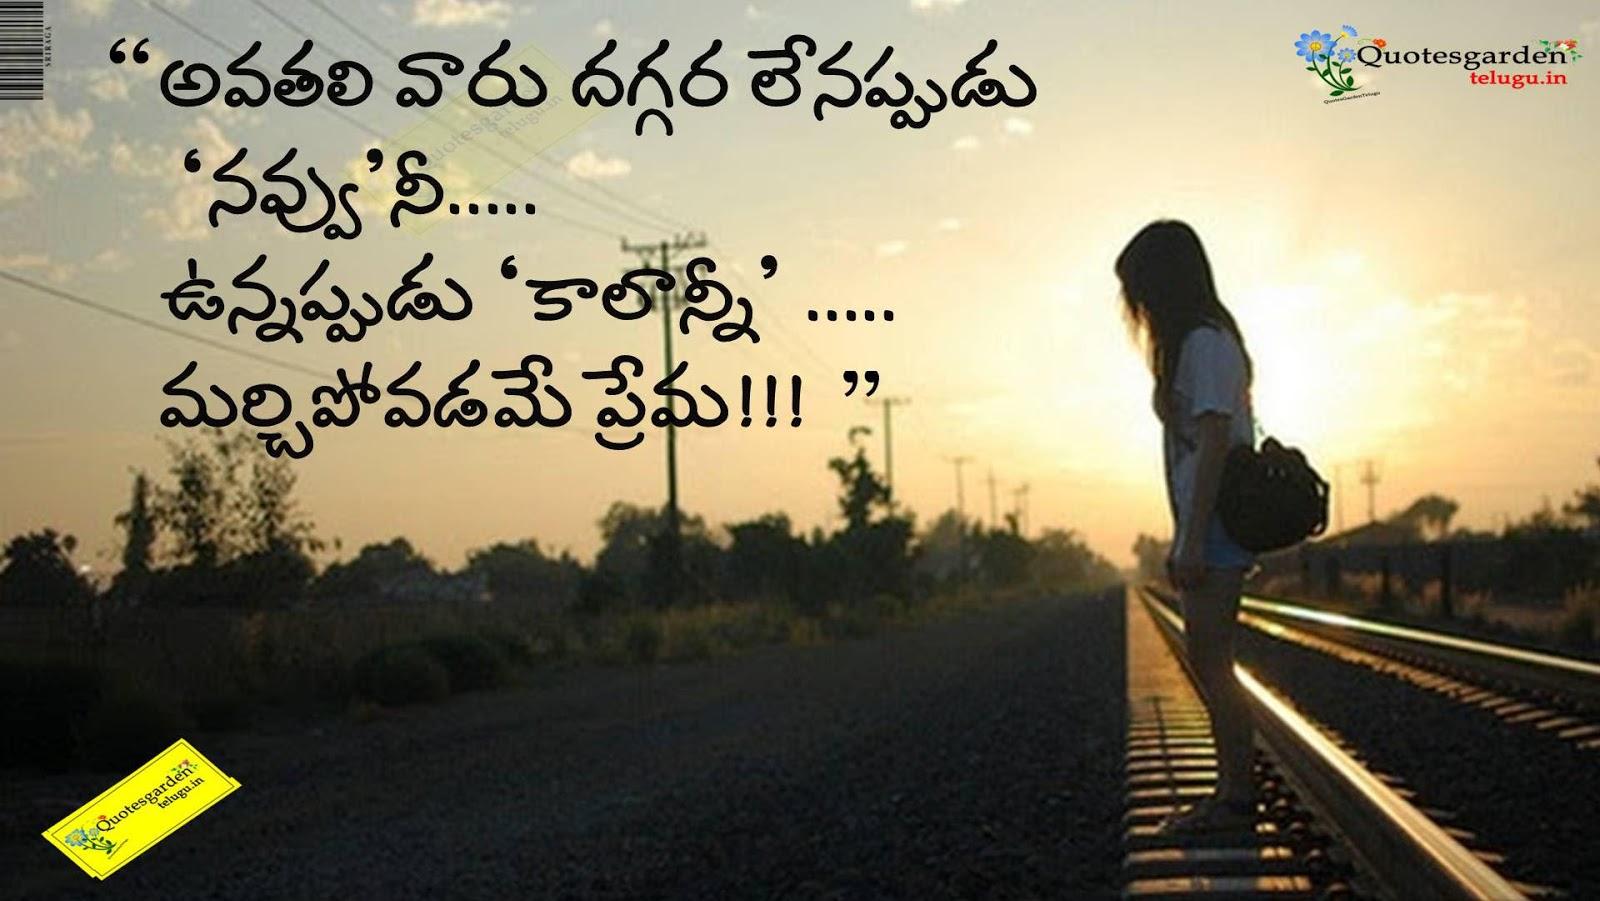 Simple Wallpaper Love Telugu - Best%2Btelugu%2Blove%2Bquotes  Image_526183.jpg